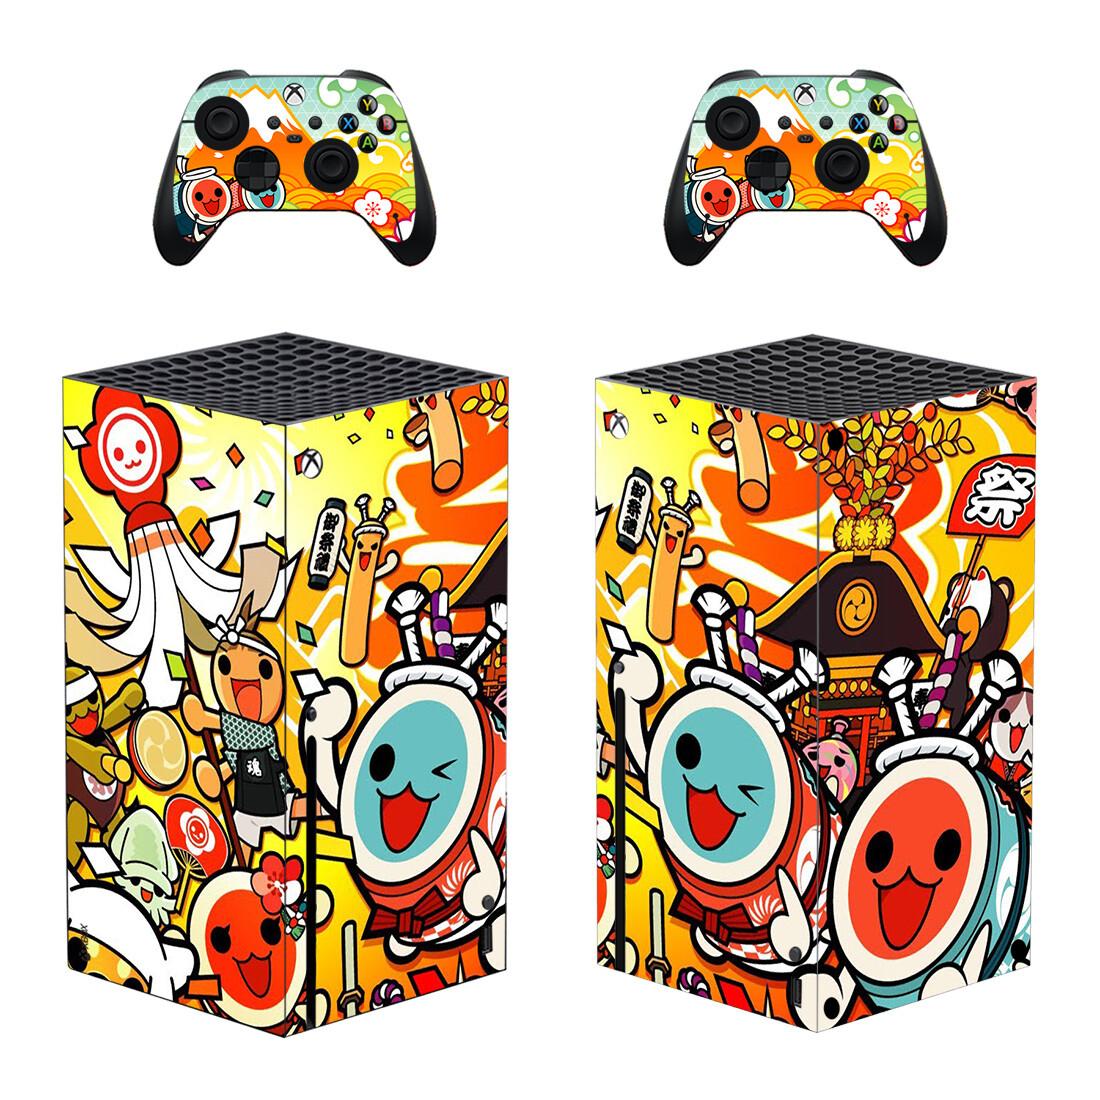 Taiko No Tatsujin Xbox Series X Skin Sticker Decal